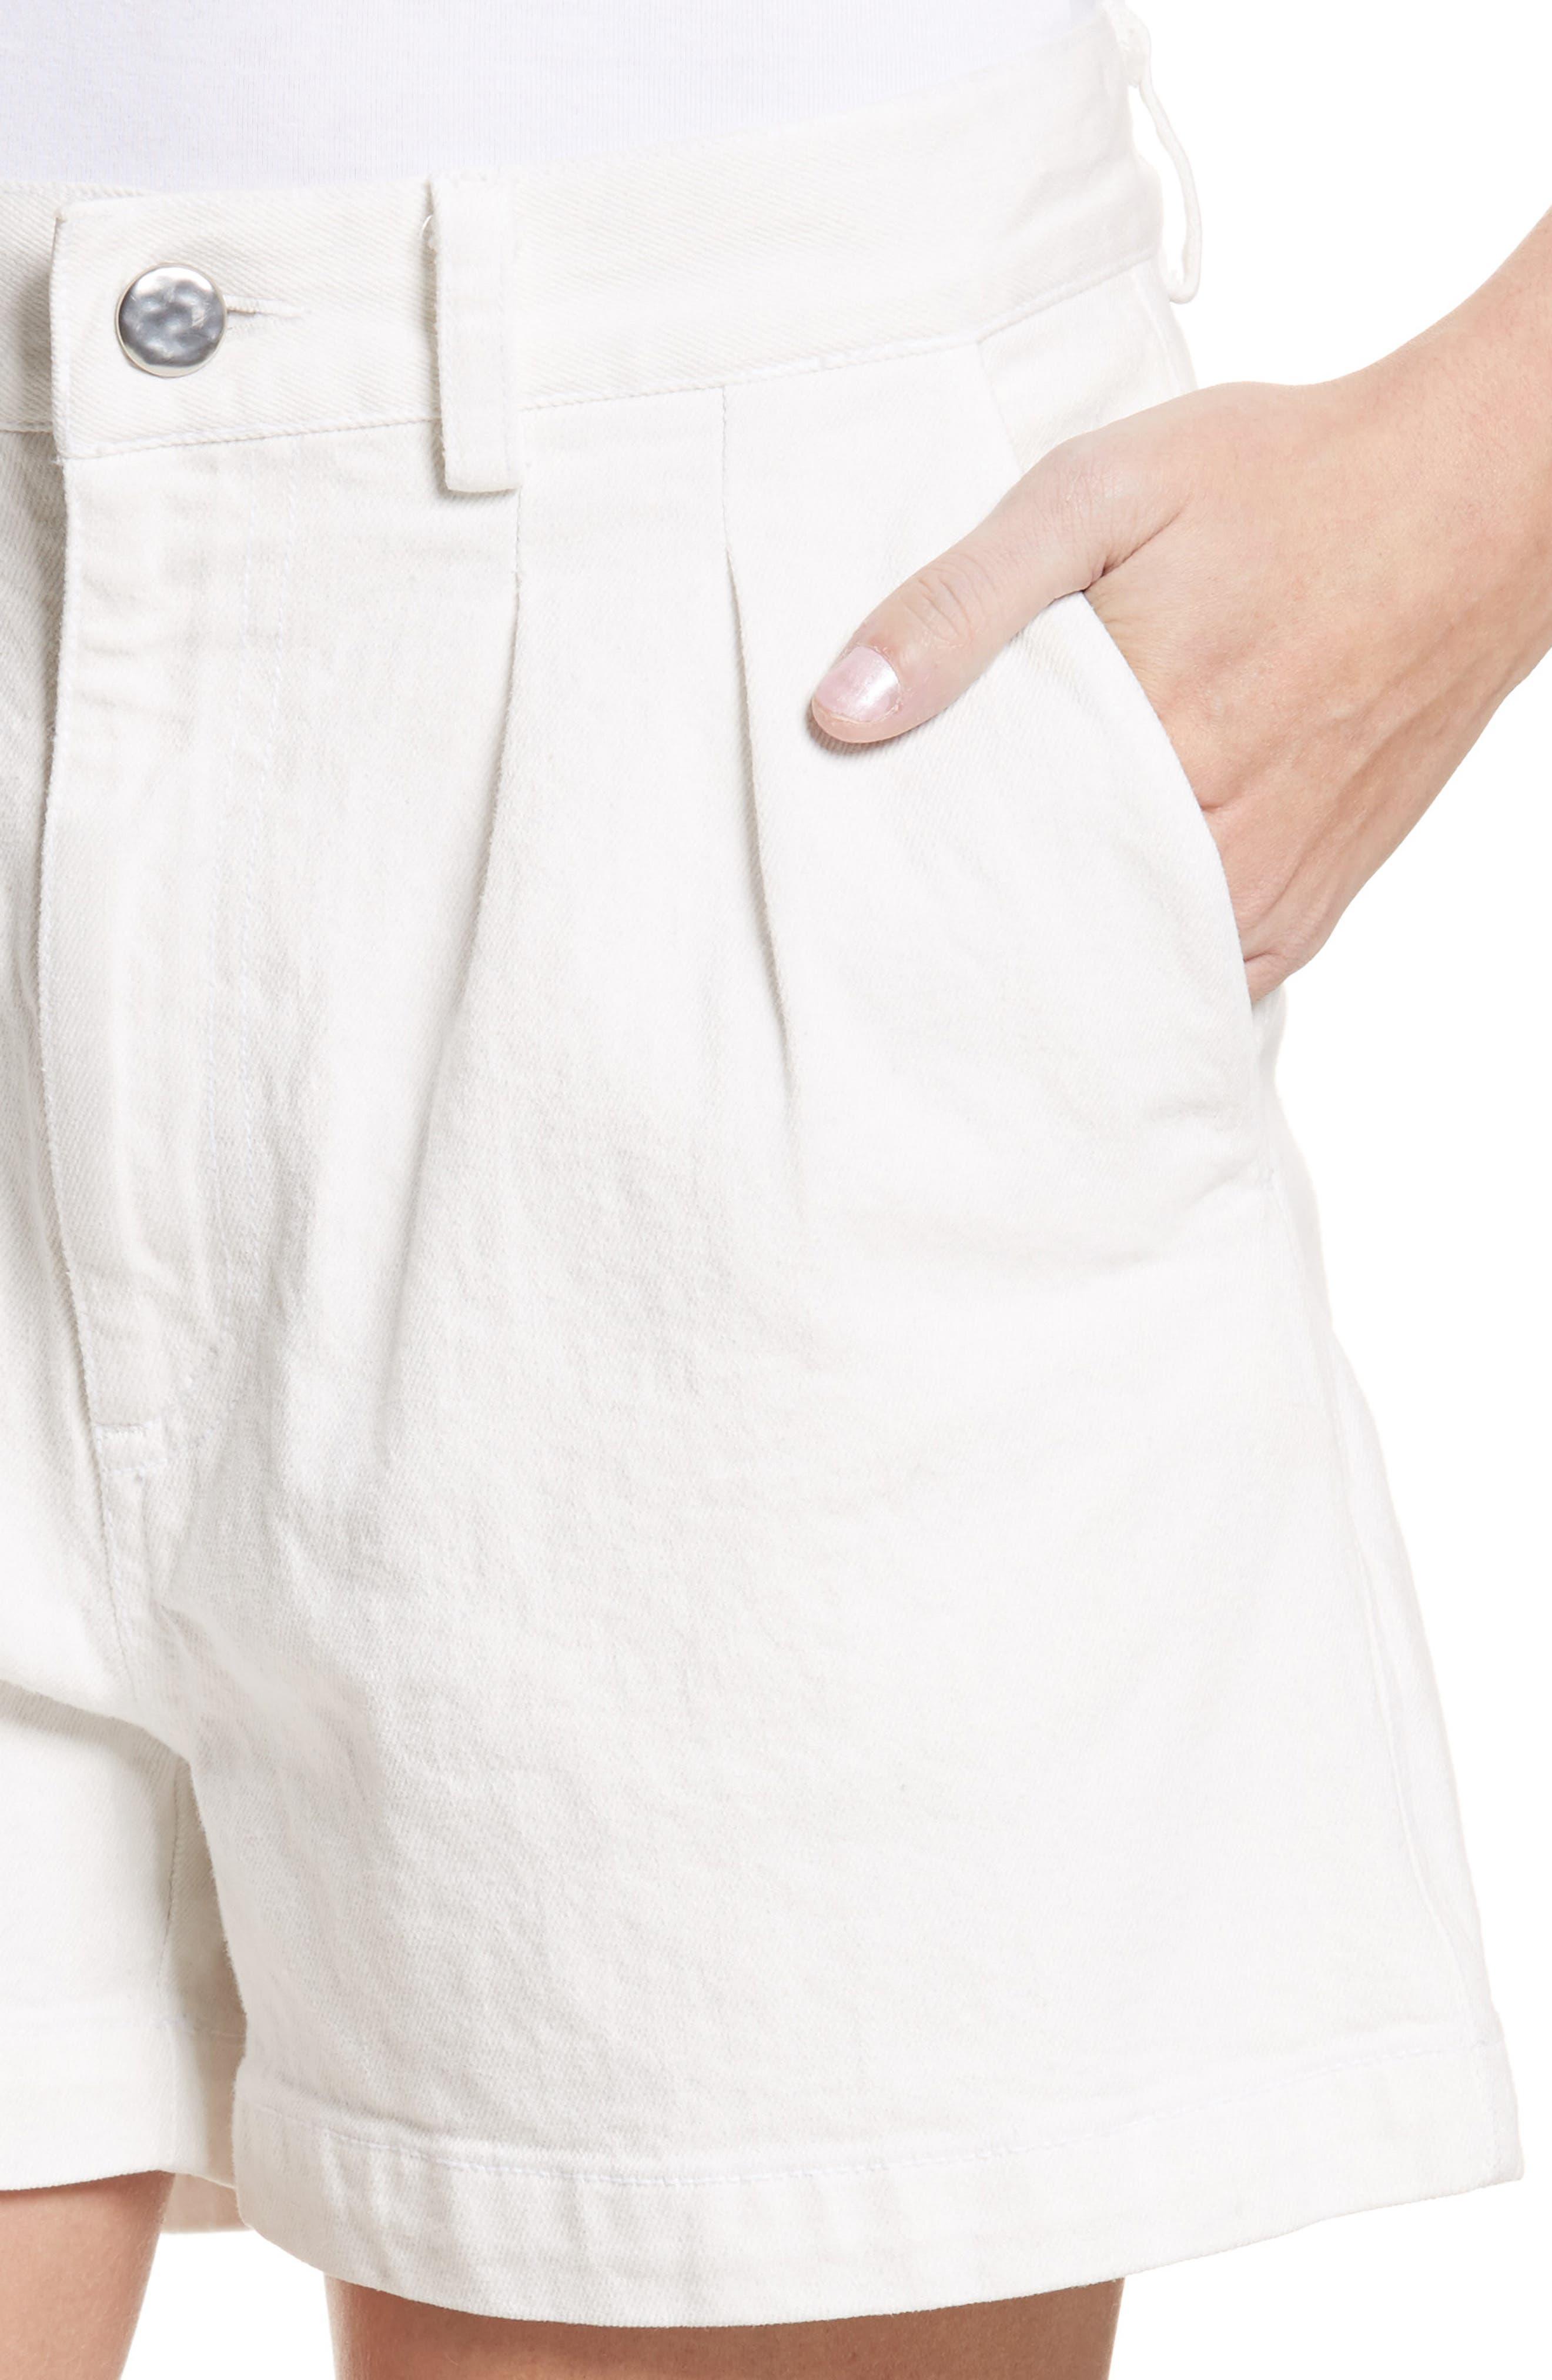 Daft Denim Shorts,                             Alternate thumbnail 4, color,                             198